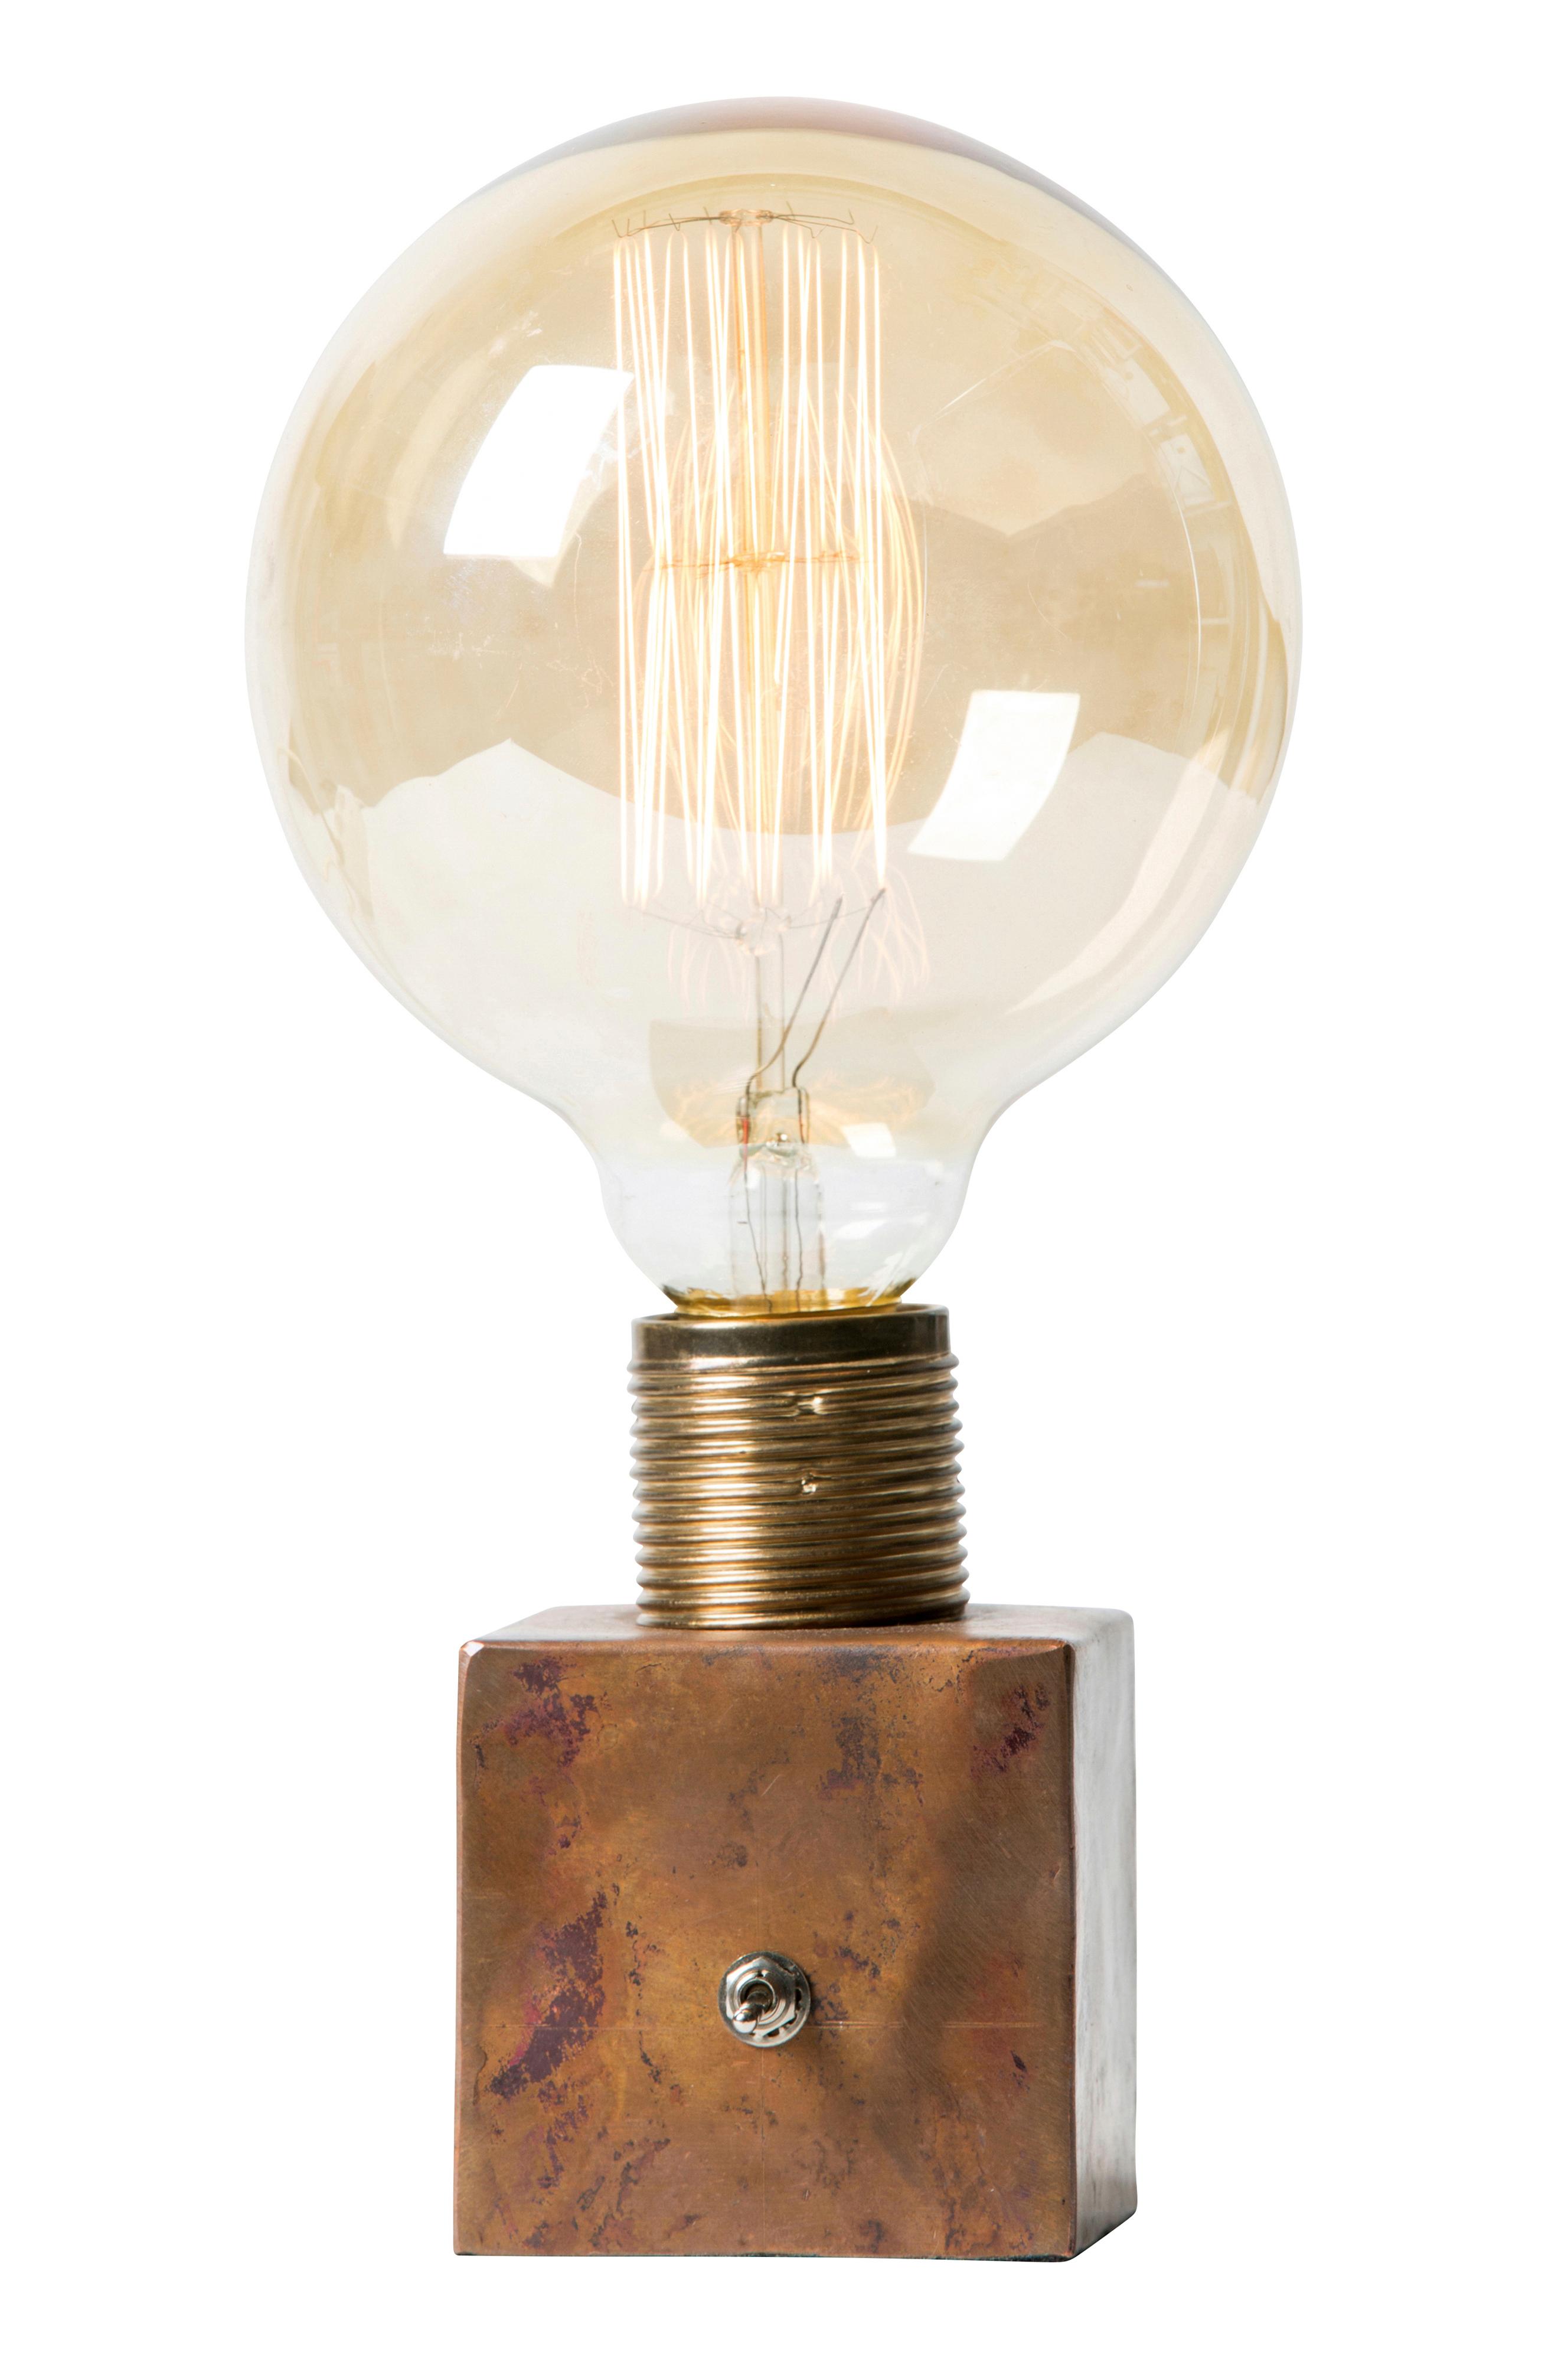 Lampfot Krille Glodlampa Lampor Koppar